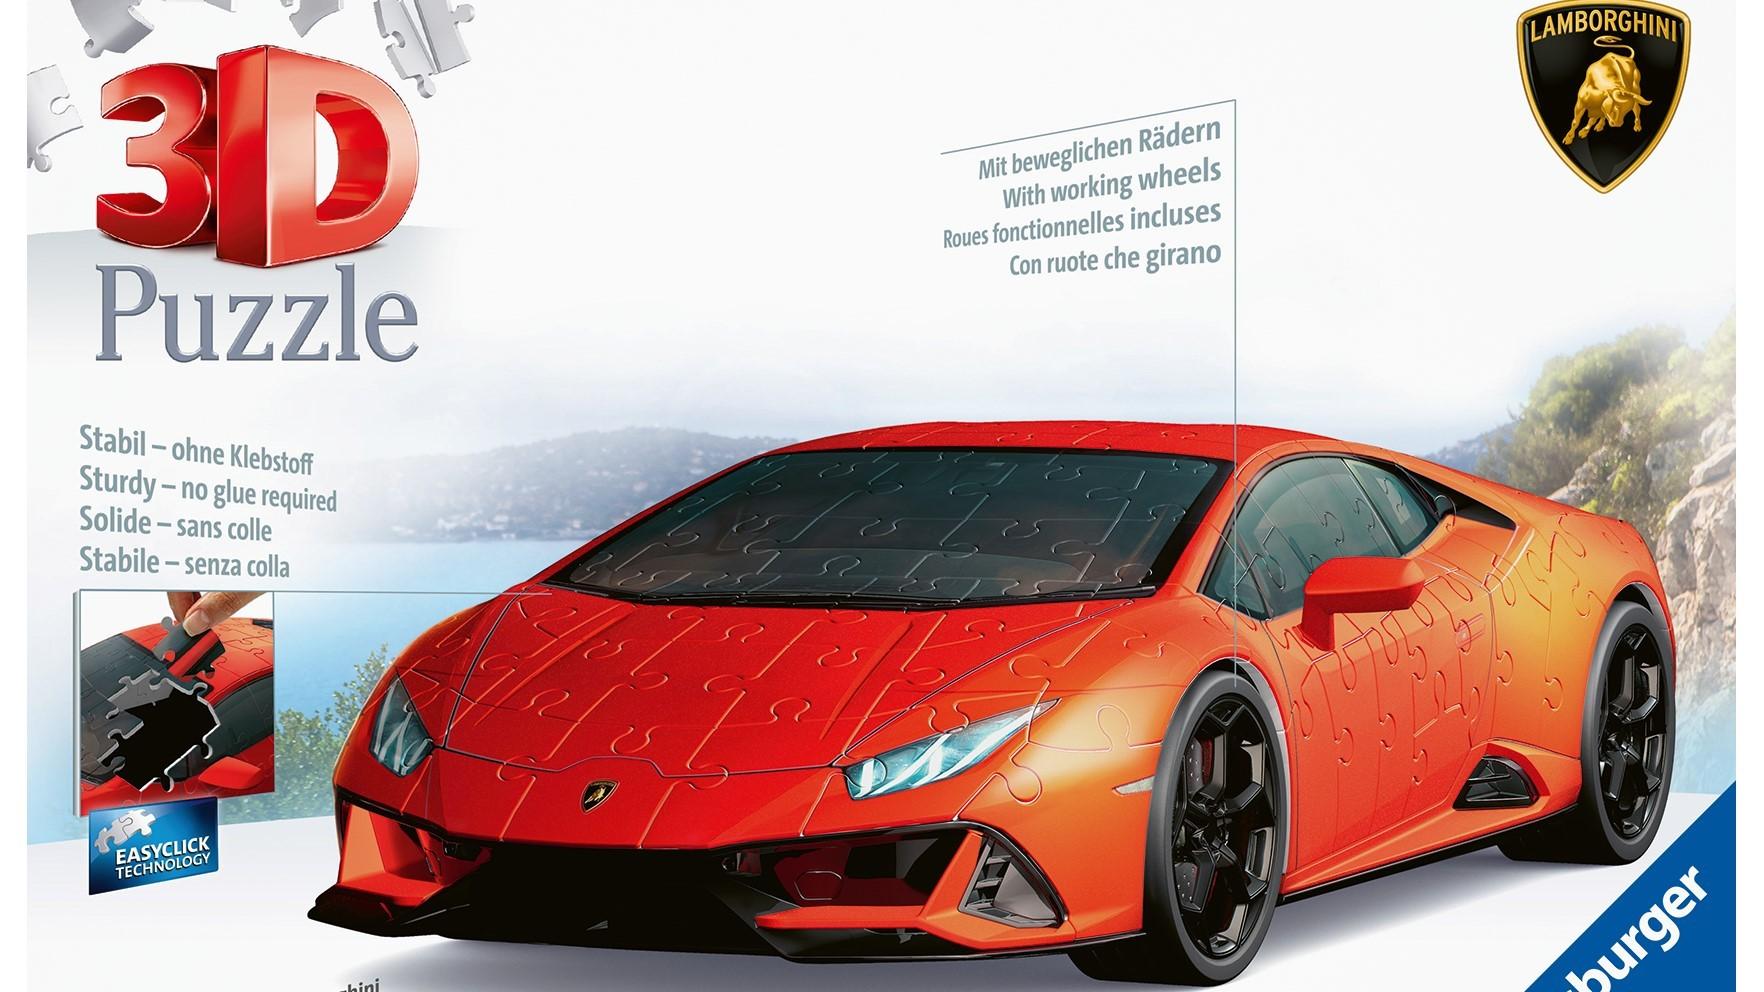 The Lamborghini Huracán EVO: build a super sports car in a 3D jigsaw puzzle - Image 4